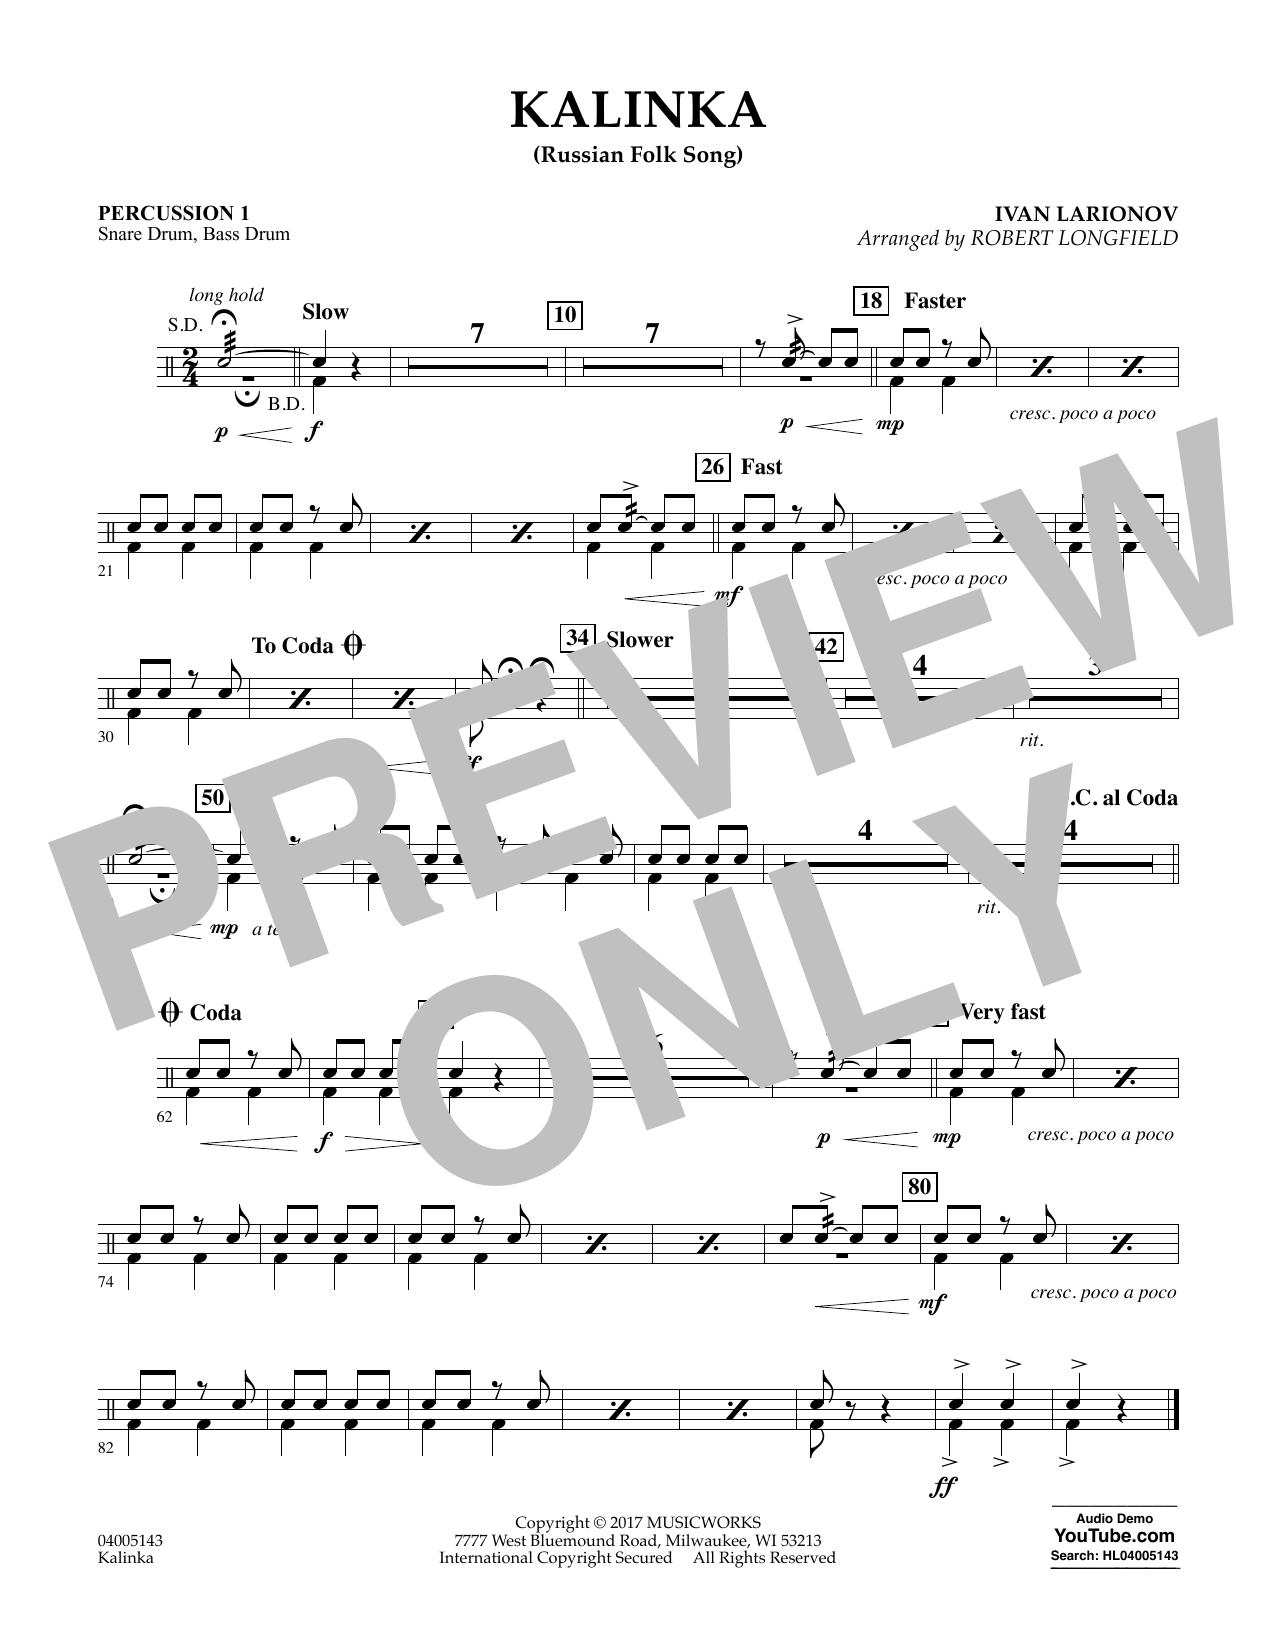 Robert Longfield Kalinka (Russian Folk Song) - Percussion 1 sheet music notes and chords. Download Printable PDF.